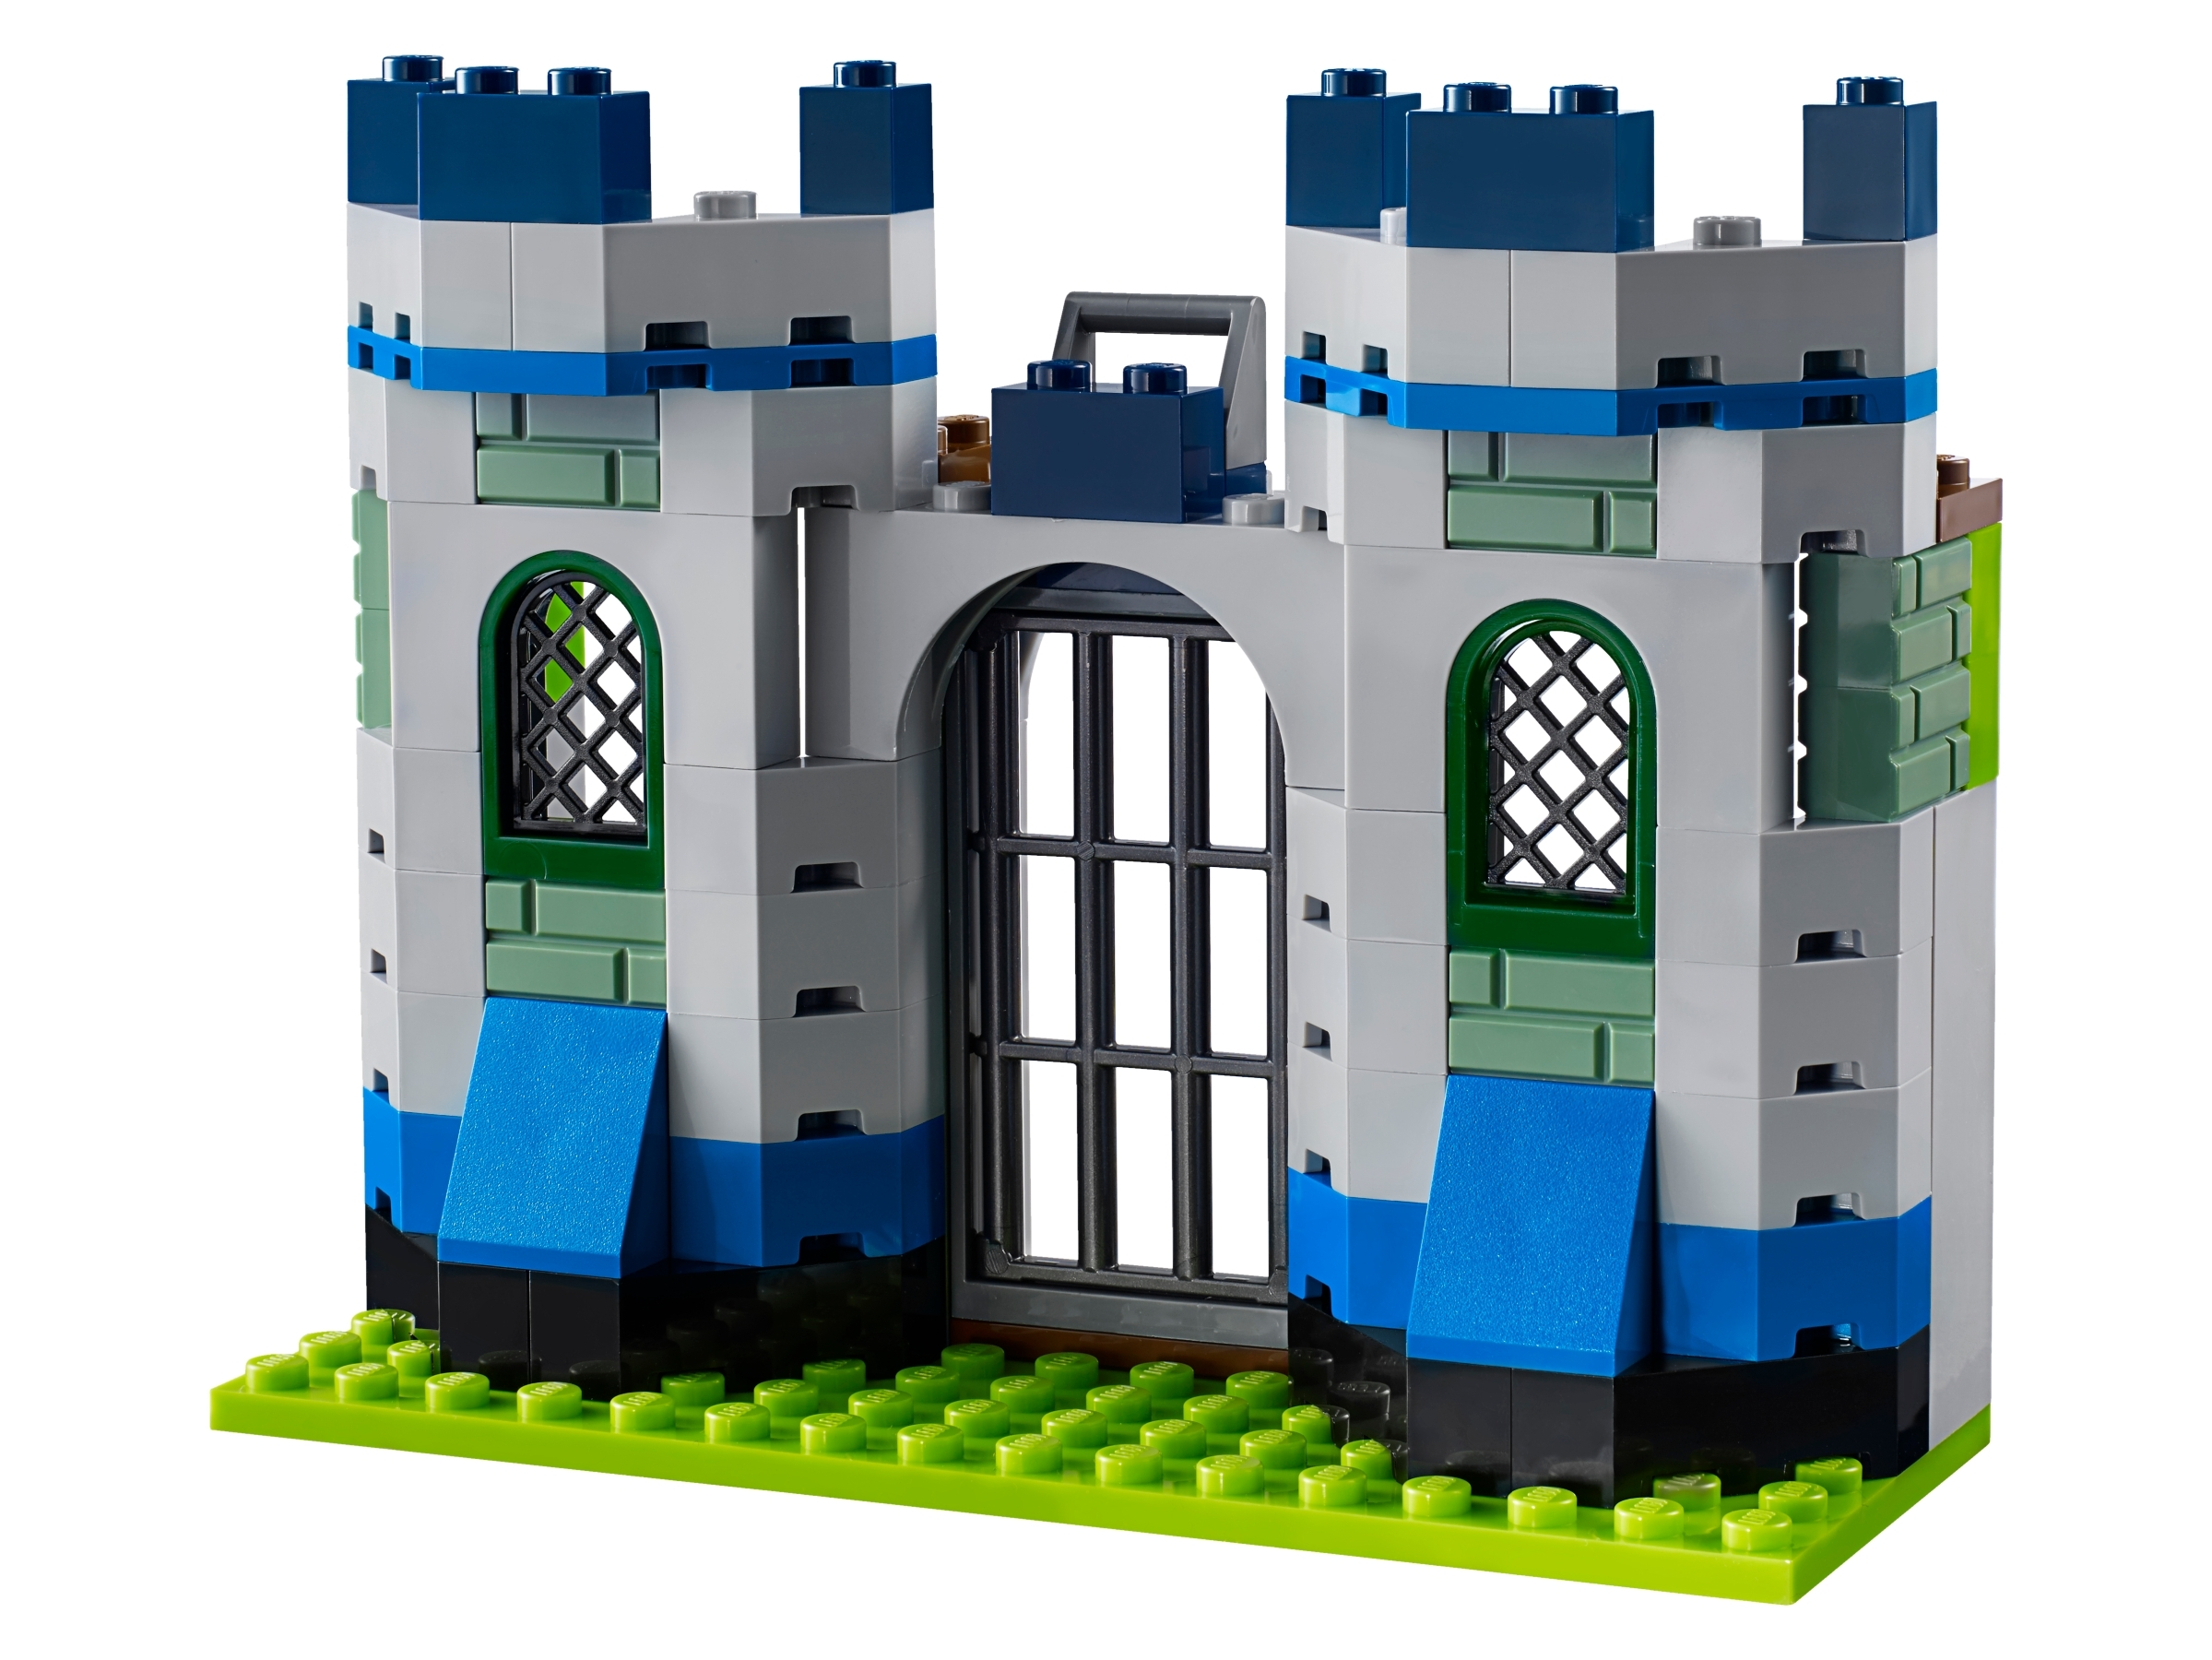 LEGO 10703 Classic Creative Builder Box Construction Set Colourful Toy Bricks,